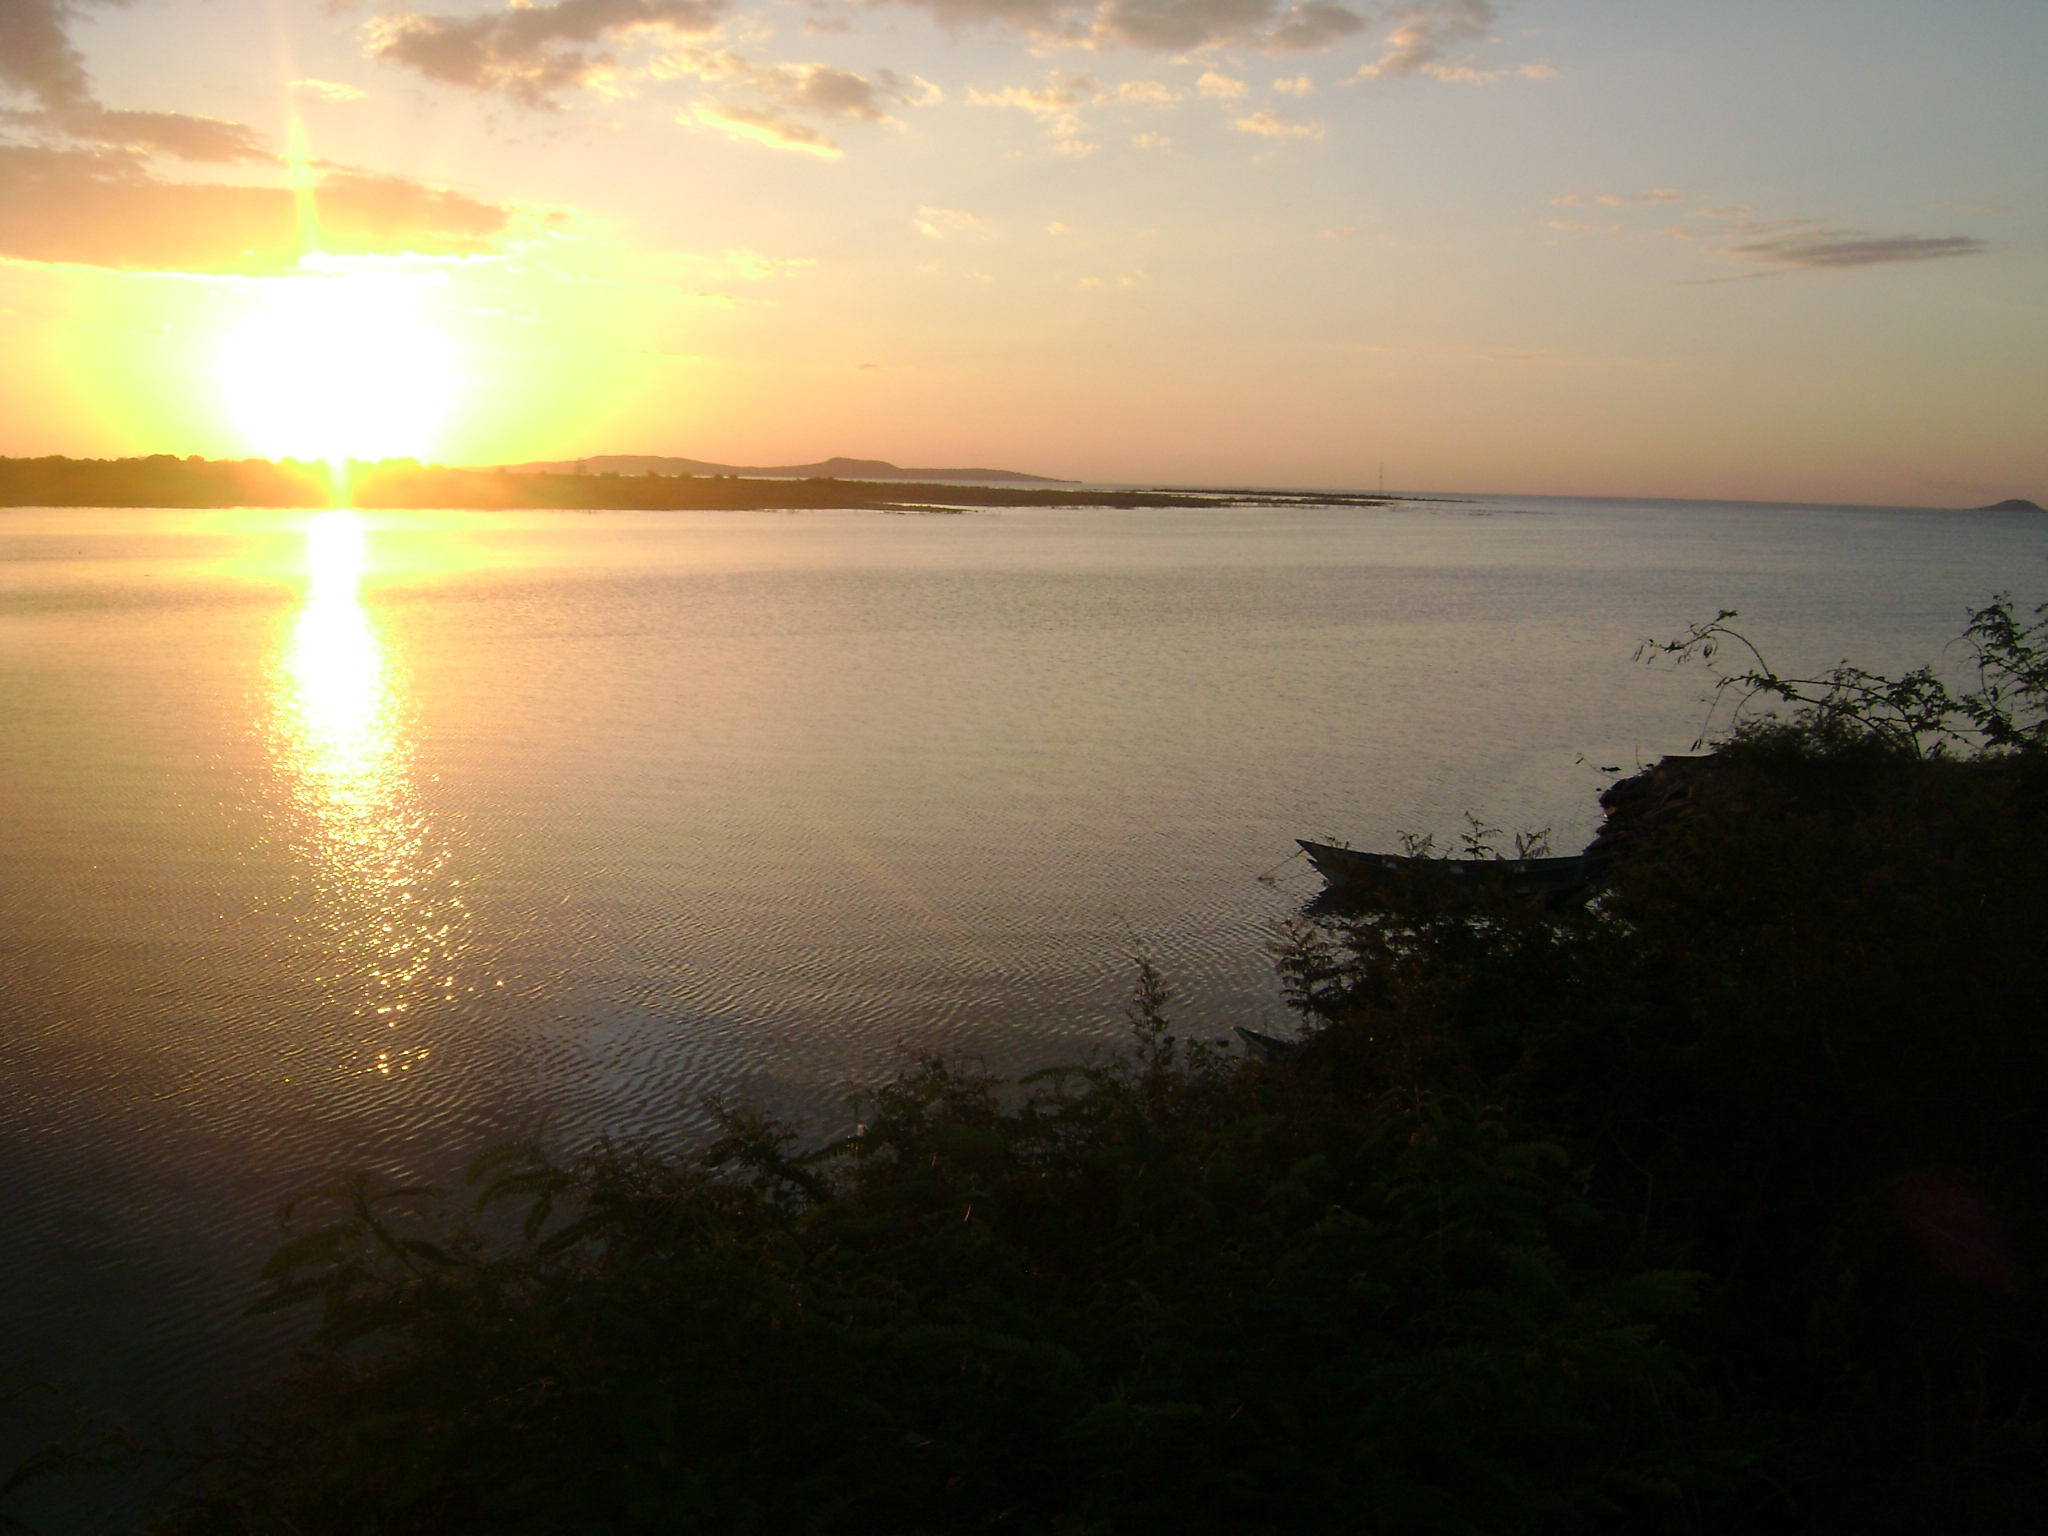 Sento Sé Bahia fonte: upload.wikimedia.org